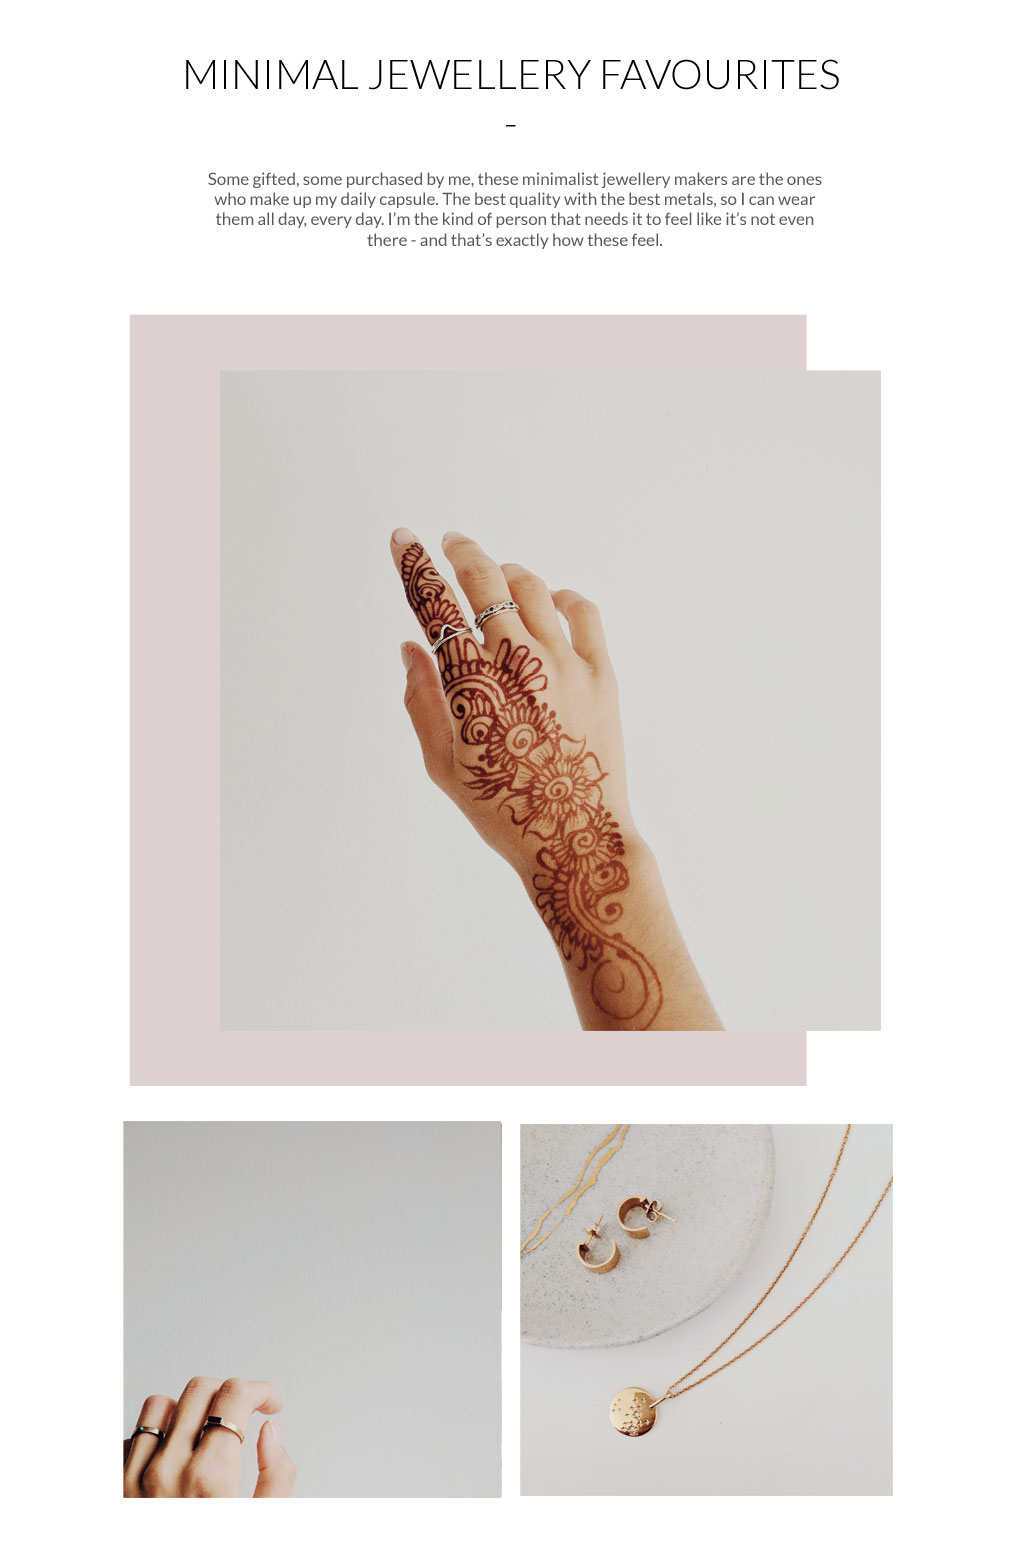 My minimal jewellery favourites: Stray Stones, Betsy & Iya, and Mejuri